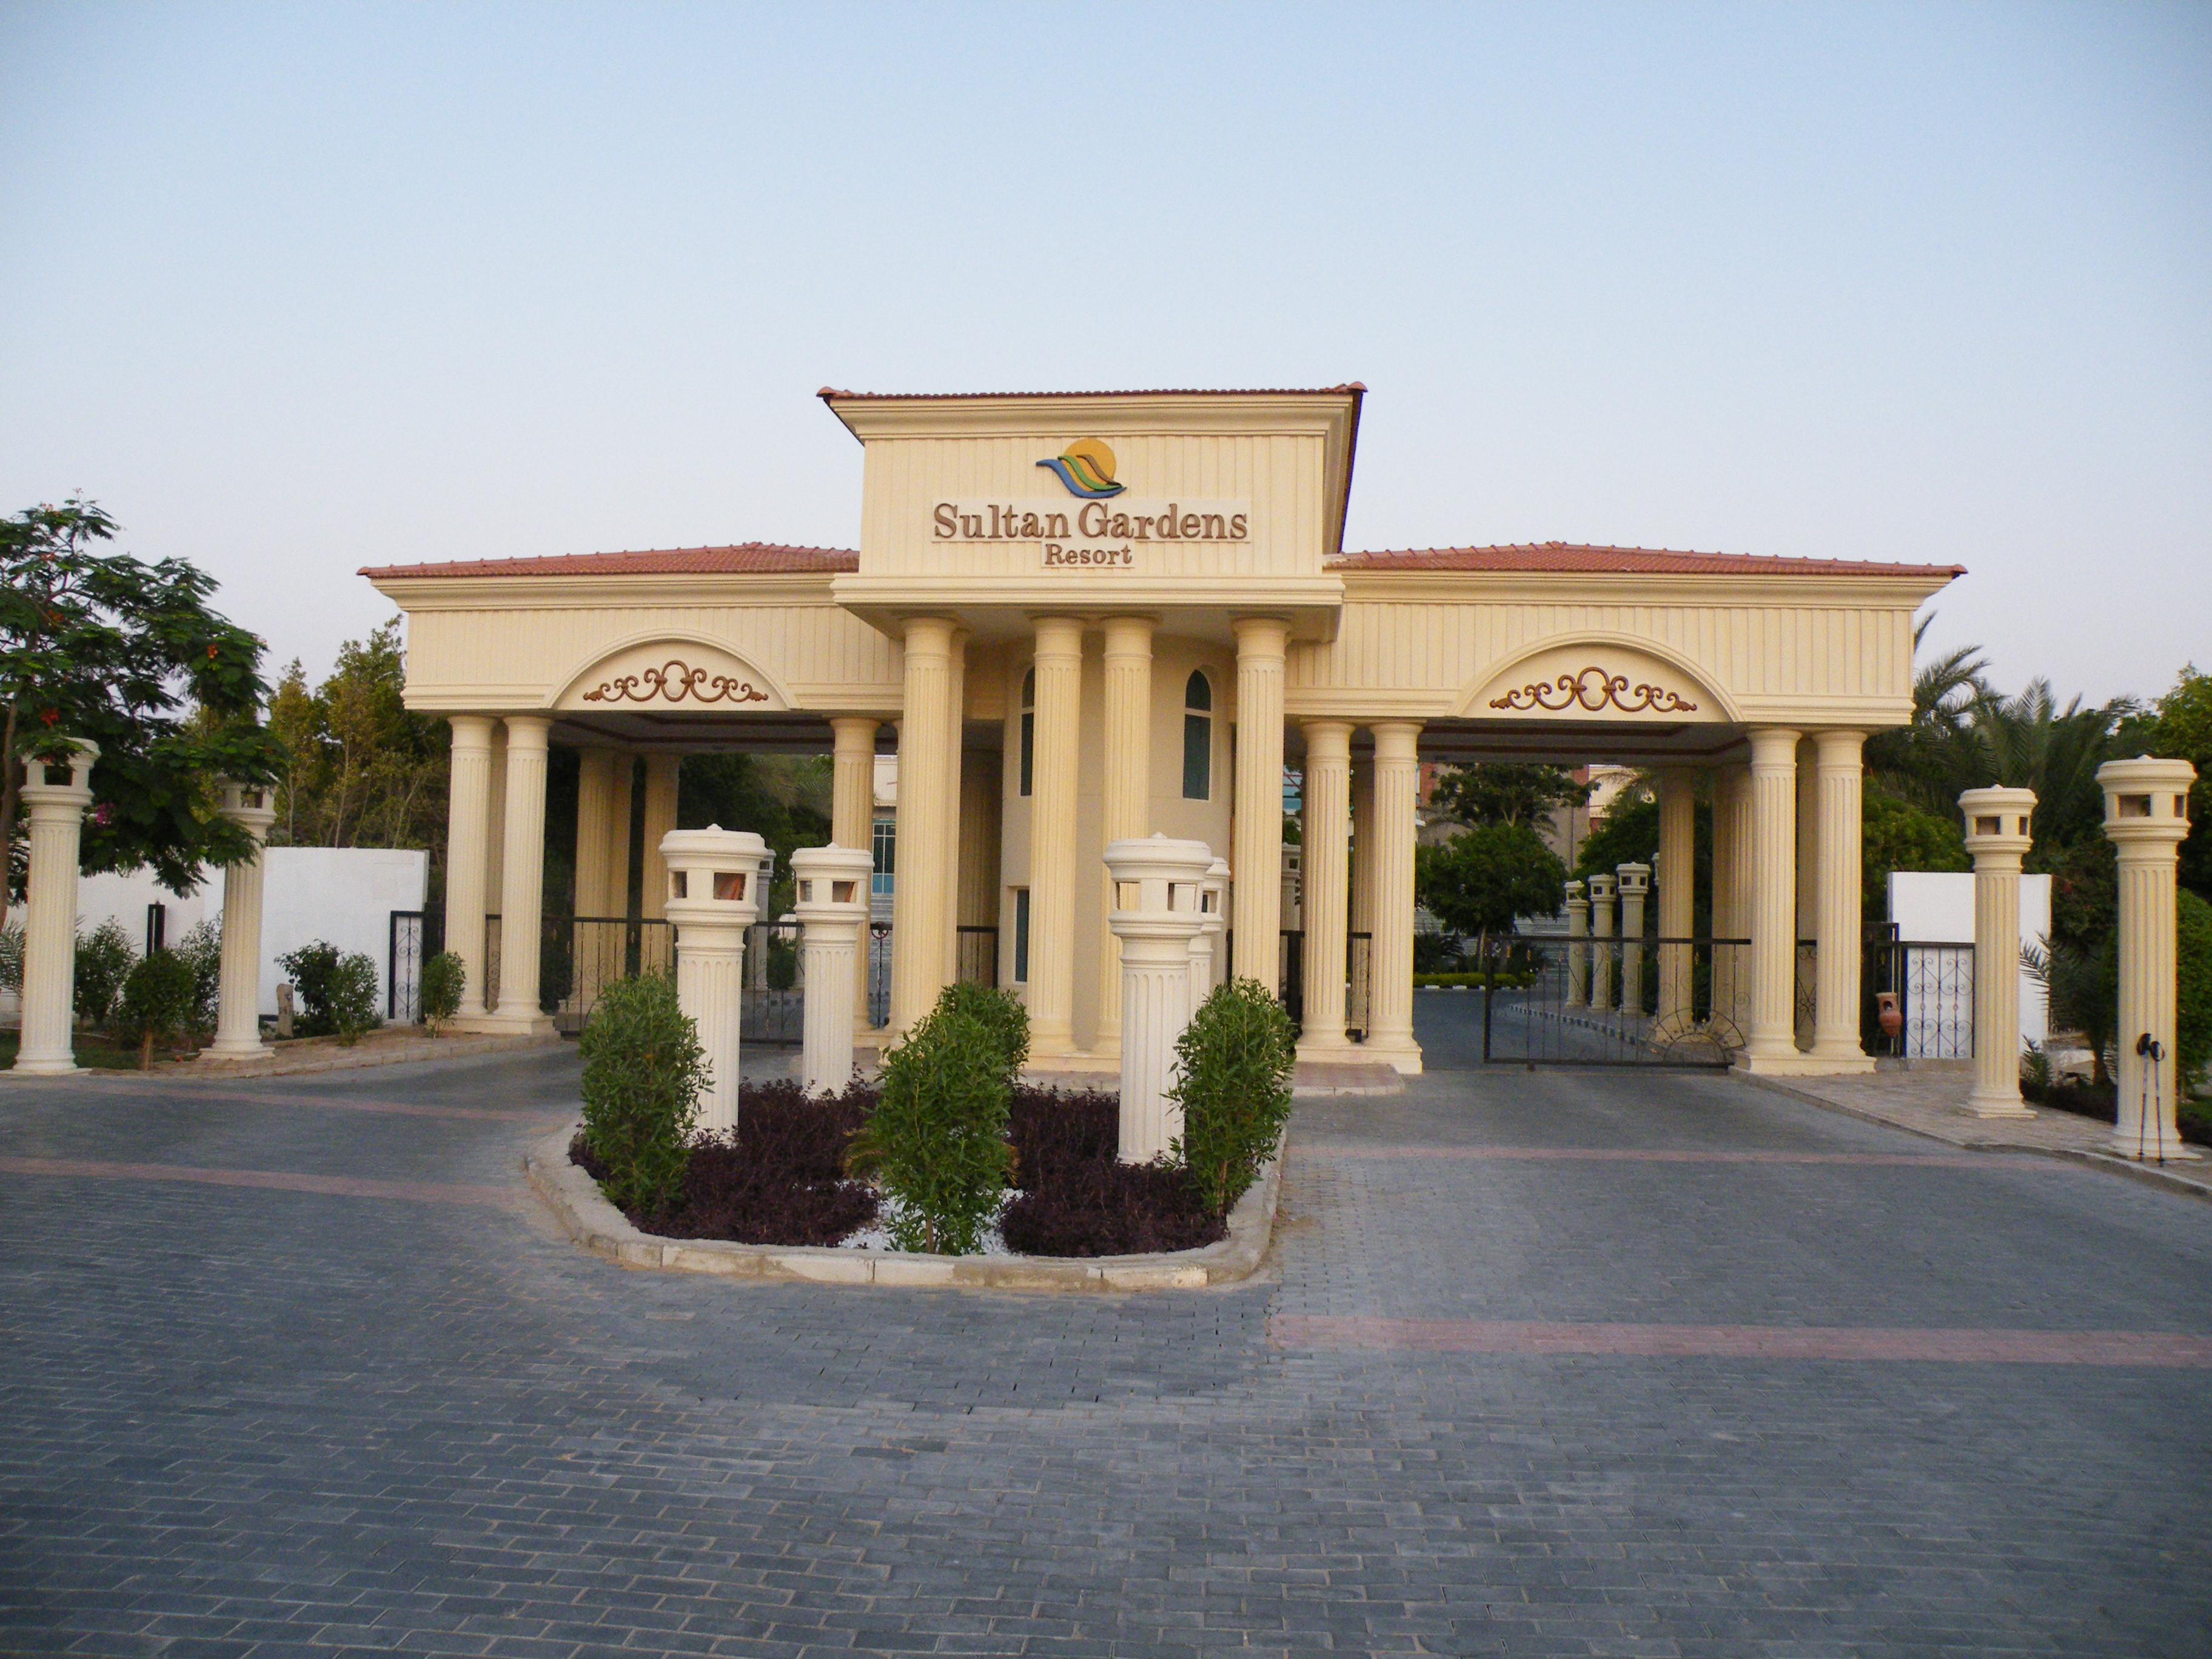 Sultan Gardens Resort image6